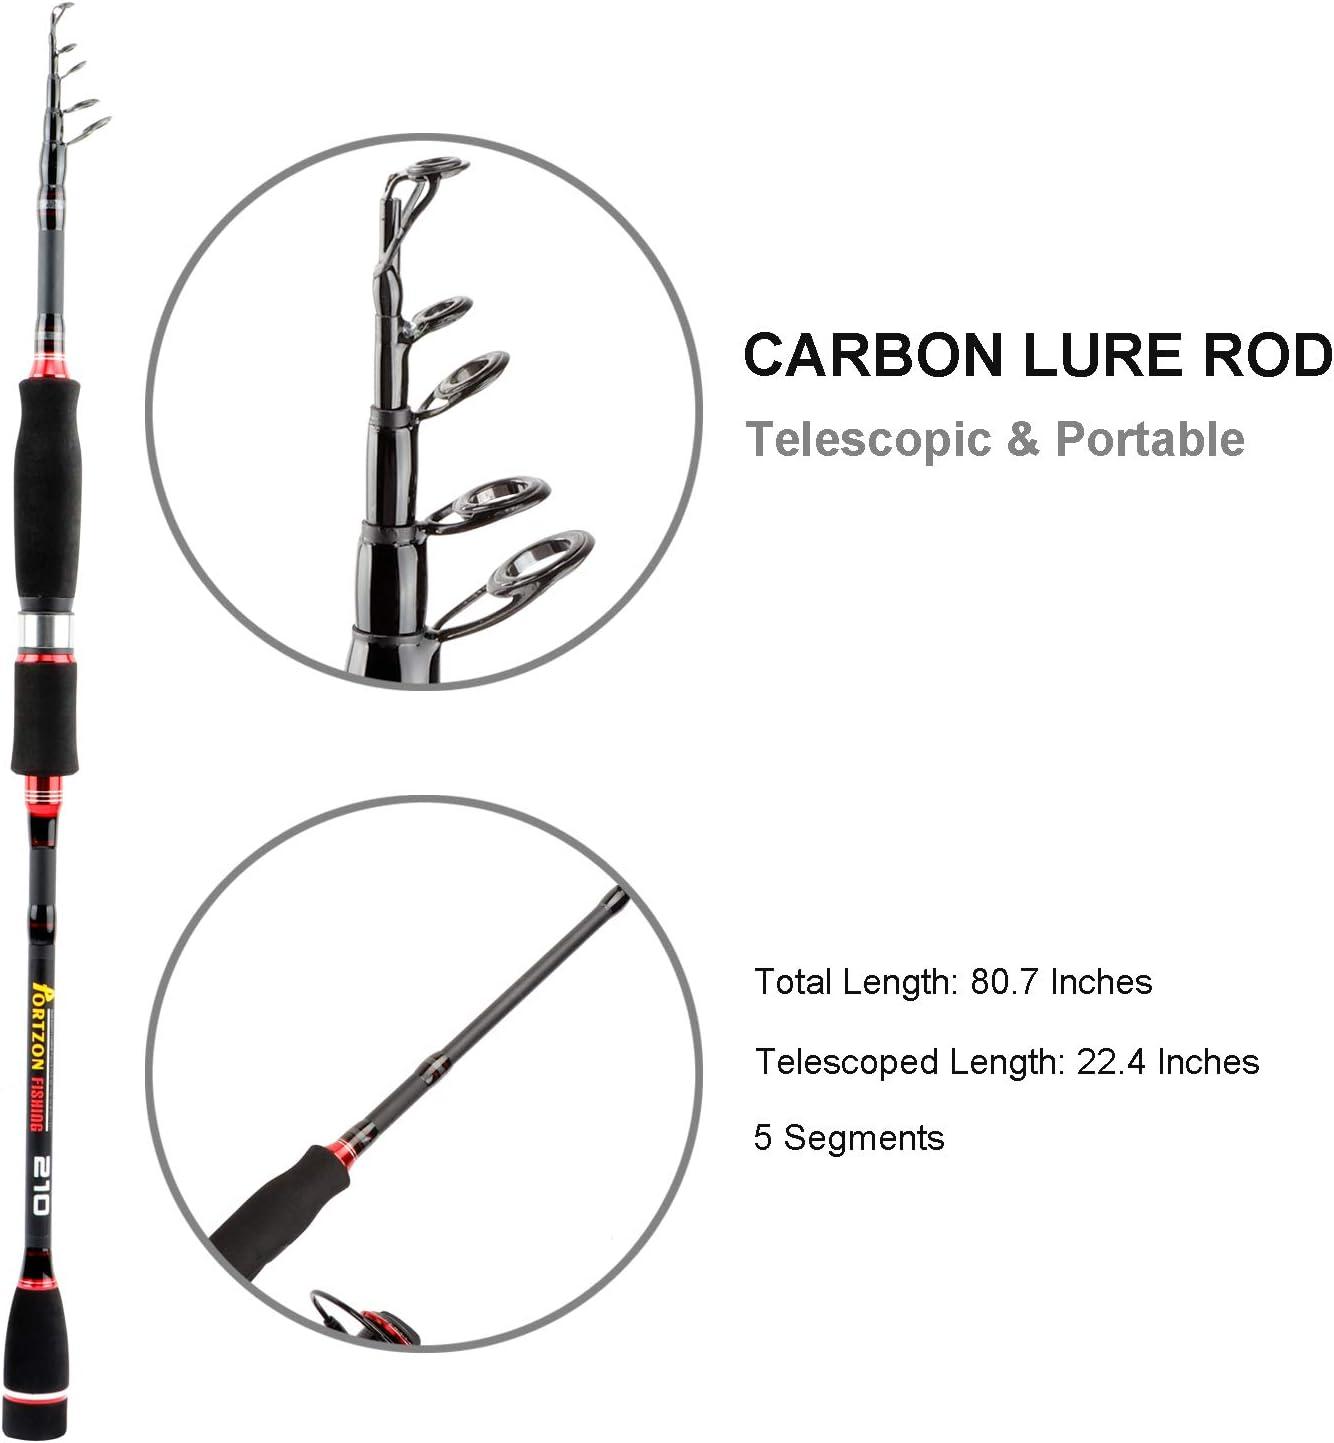 Portzon Fishing Reel Telescopic Fishing Rod and Reel Combos Full KitPortzon Spinning Reel, 5.1 1,7000 Fishing Reel Spinning, Freshwater Reel Fishing Gear for Lack Reservoir Pond Stream Travel